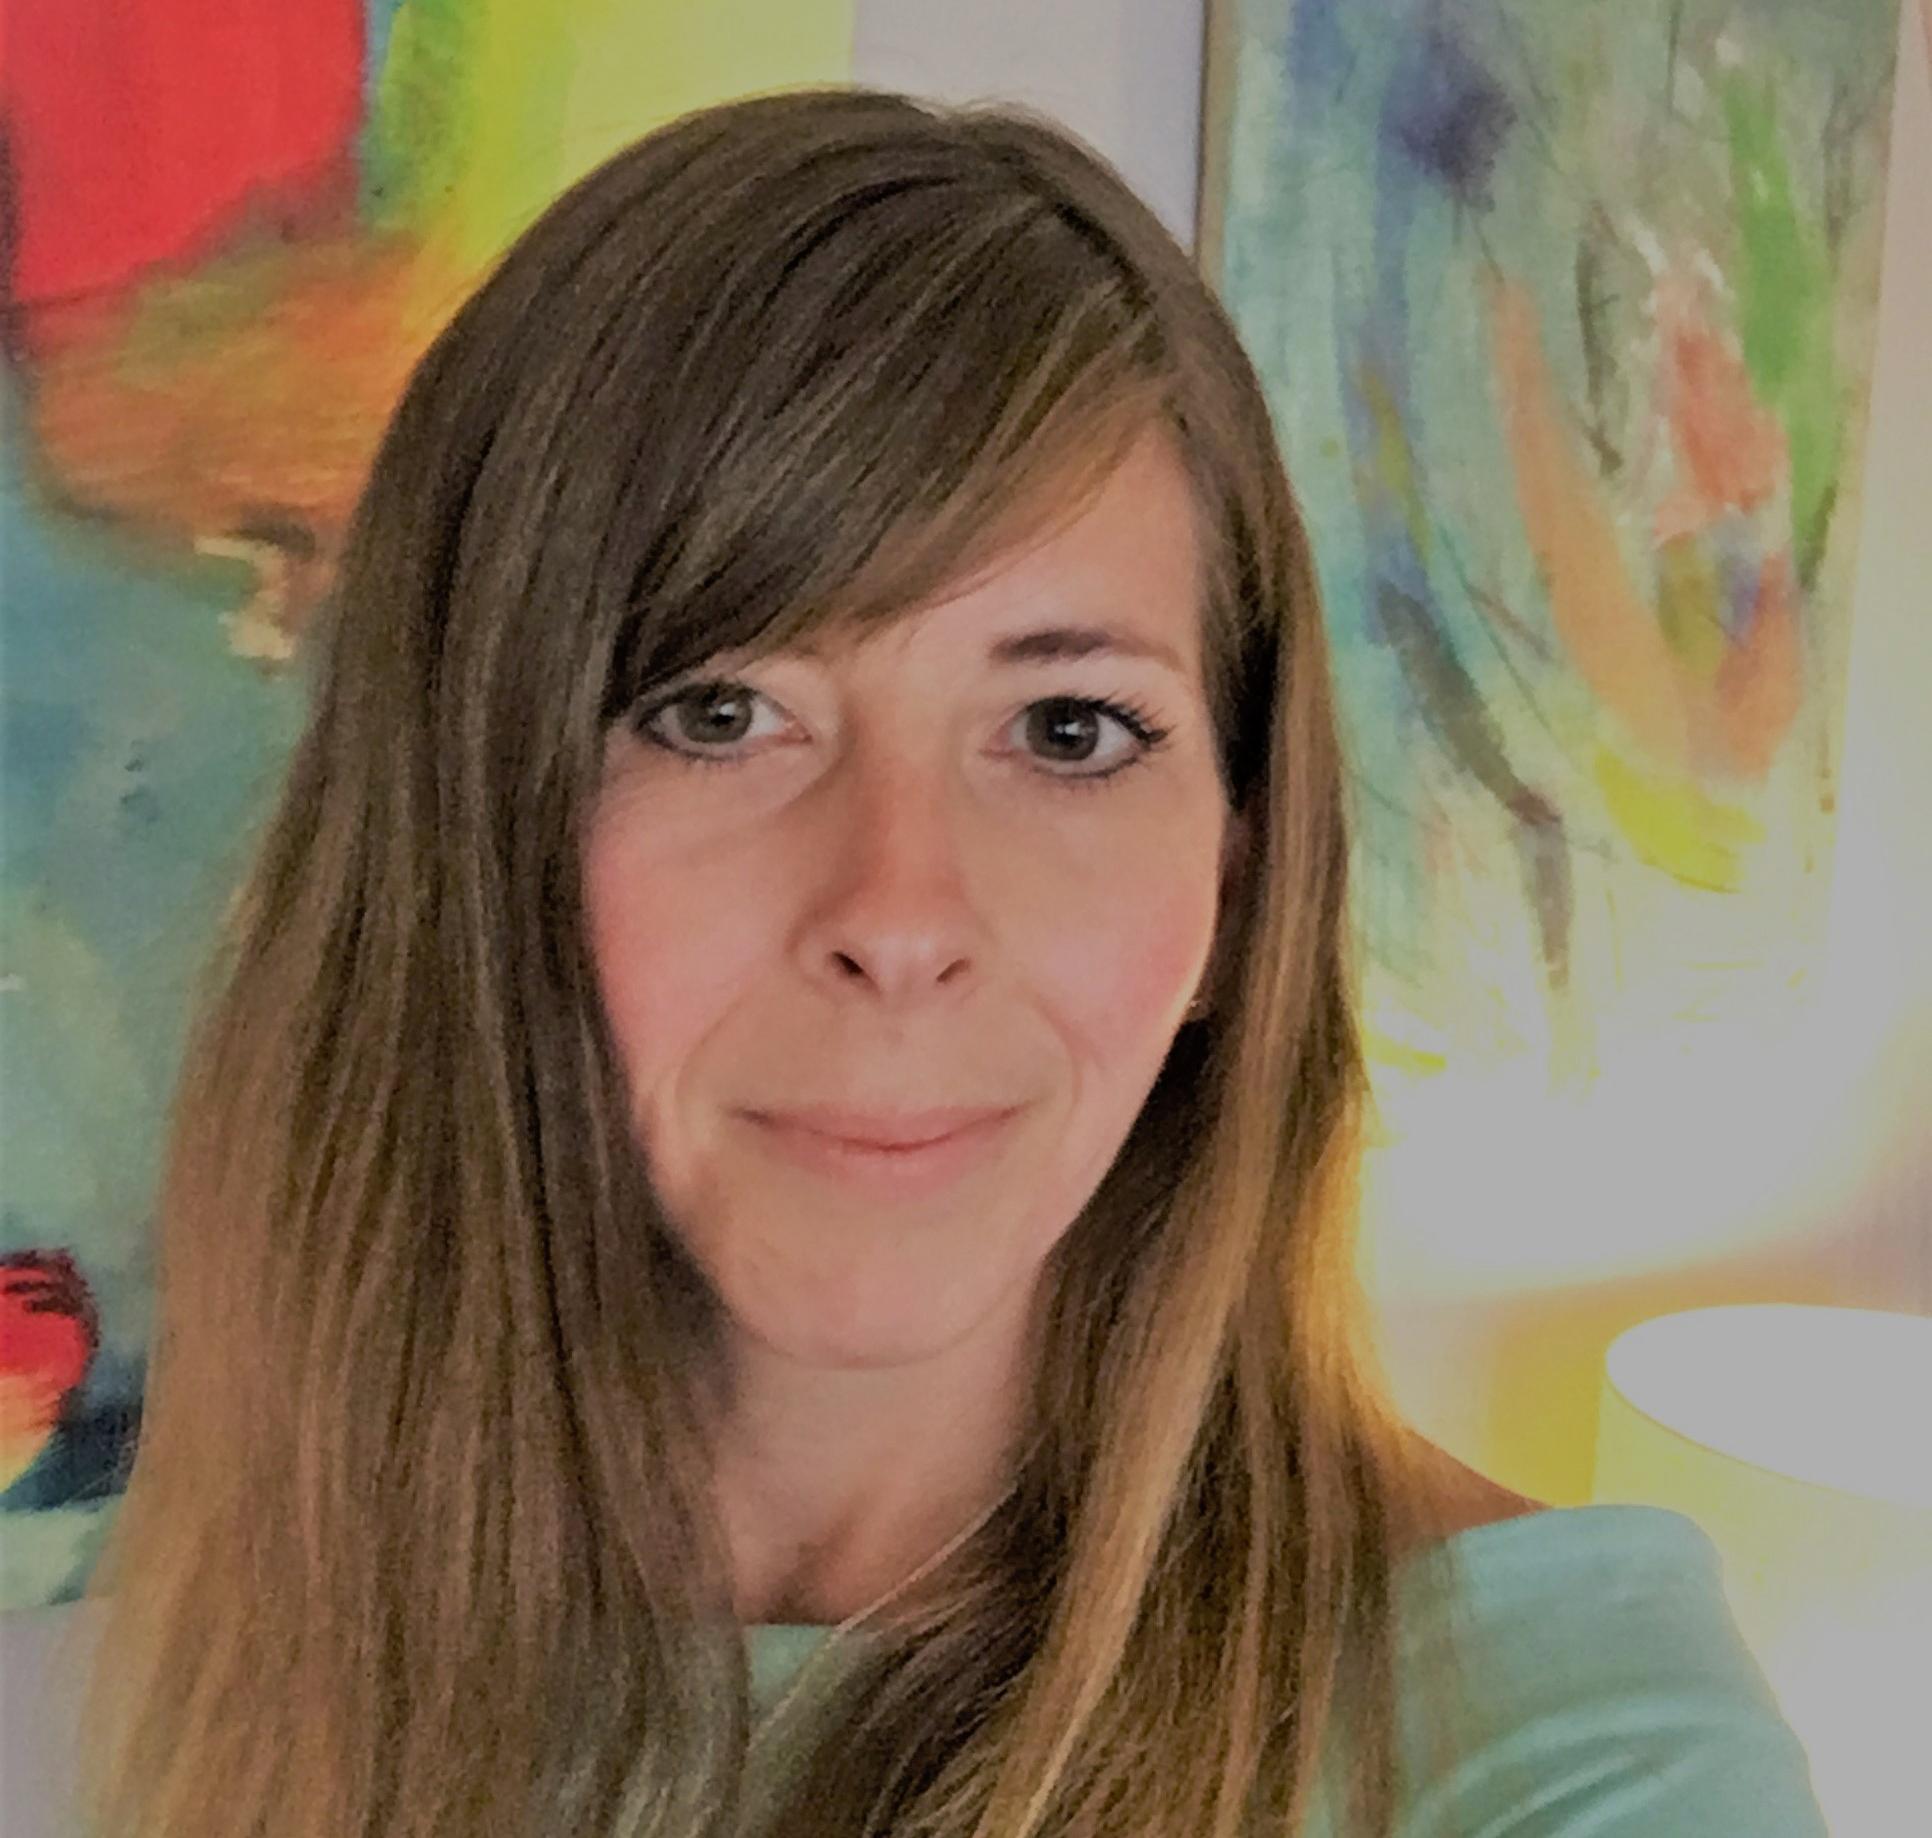 Zoe Jarrold